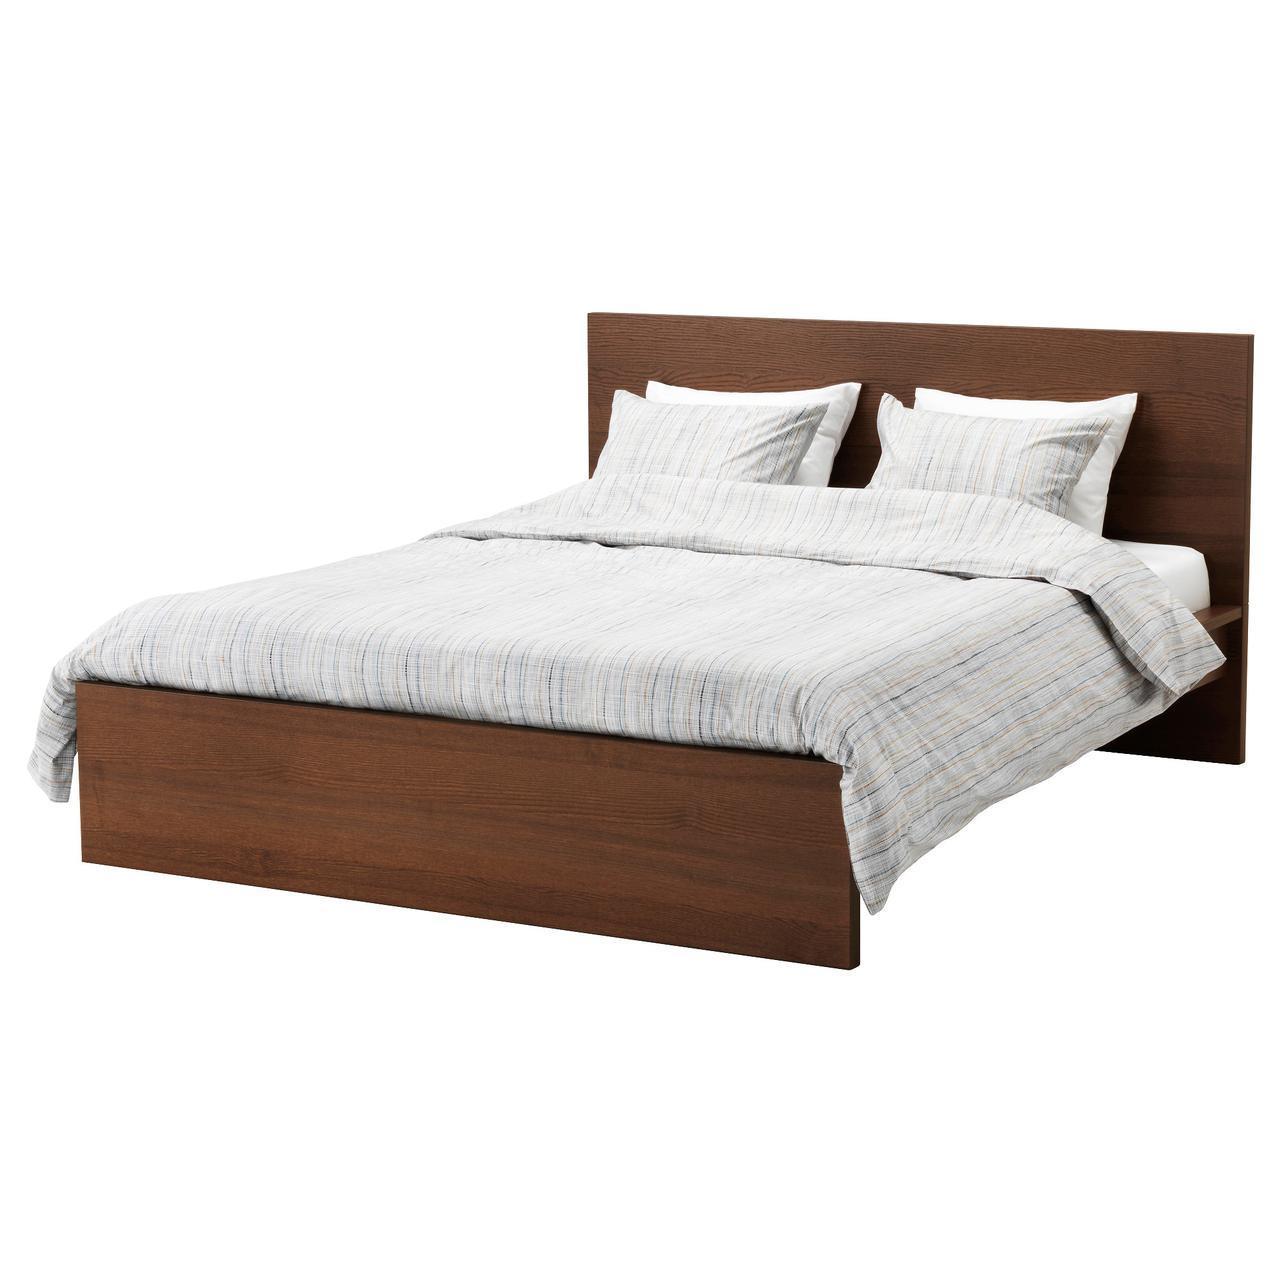 IKEA MALM (391.570.71) MALM КАРКАС кровати, высокий, окрашенный коричневым шпоном ясеня, Leirsund, 160x200 см